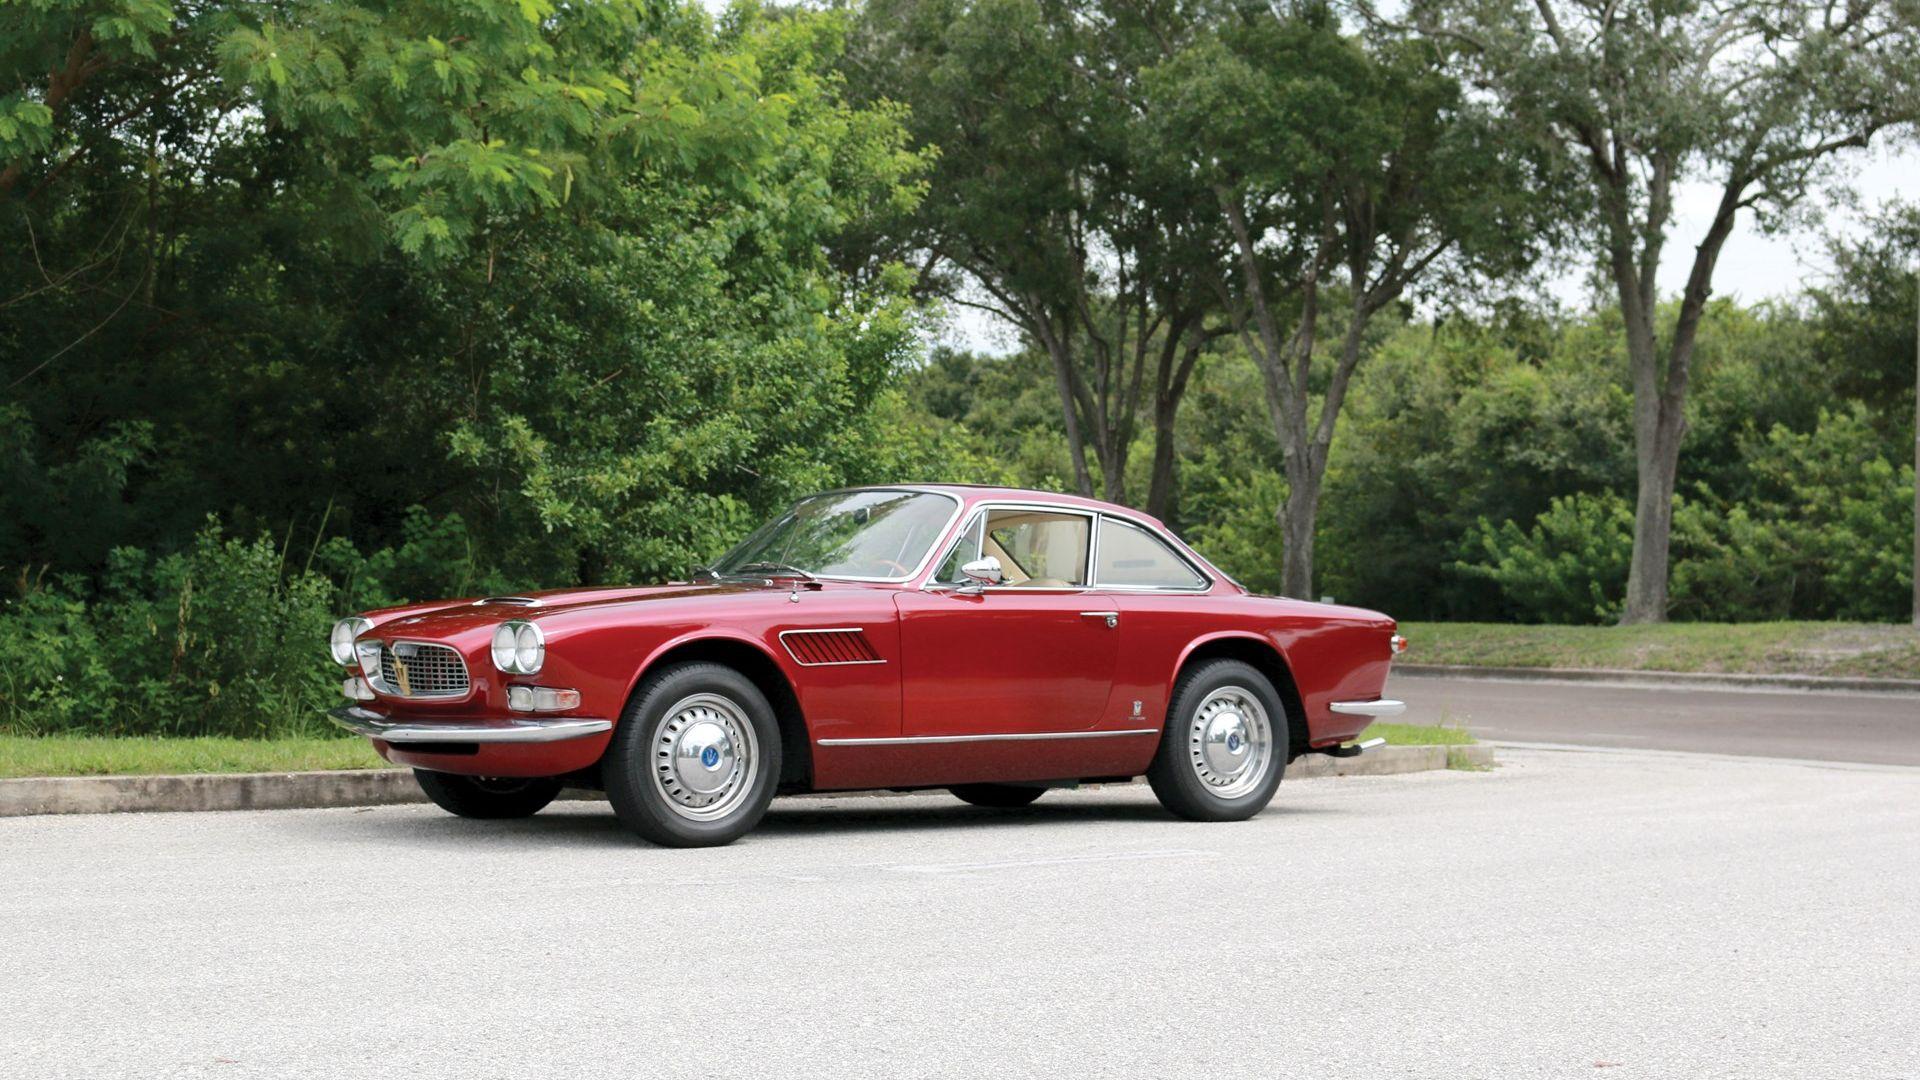 1965 Maserati 3500 GTI Sebring Series II - CLASSIC.COM